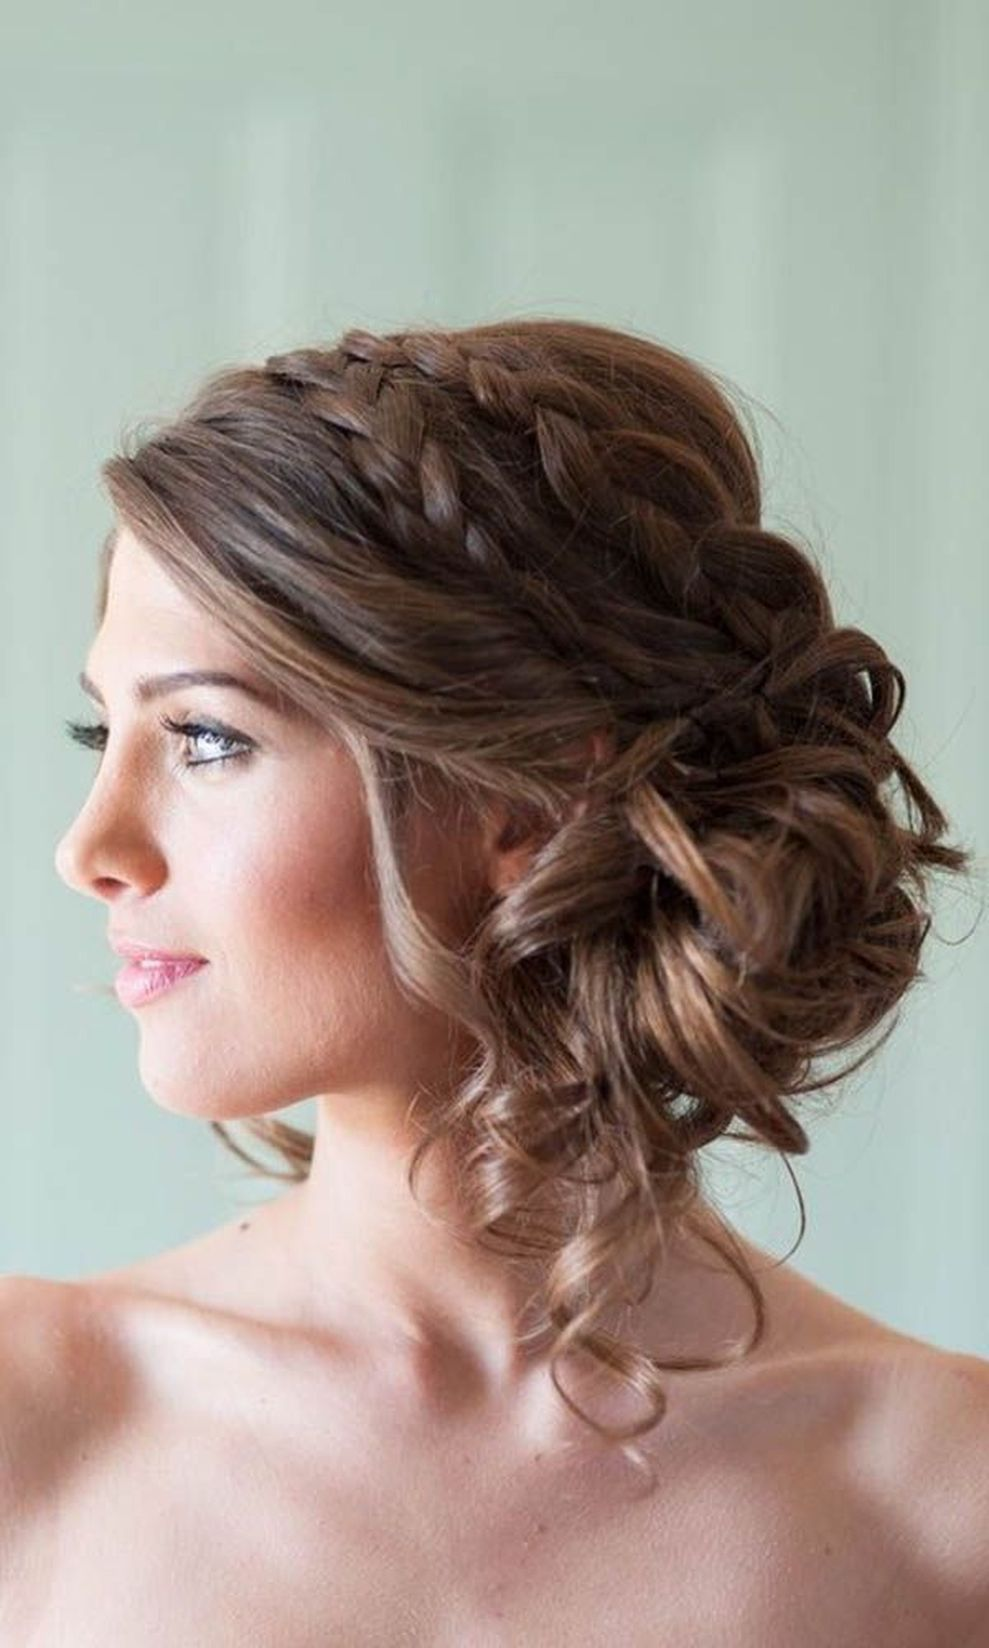 Wedding Hairstyles Medium Length Hair Magnificent 44 Beautiful Wedding Hairstyles Ideas For Medium Length Hair